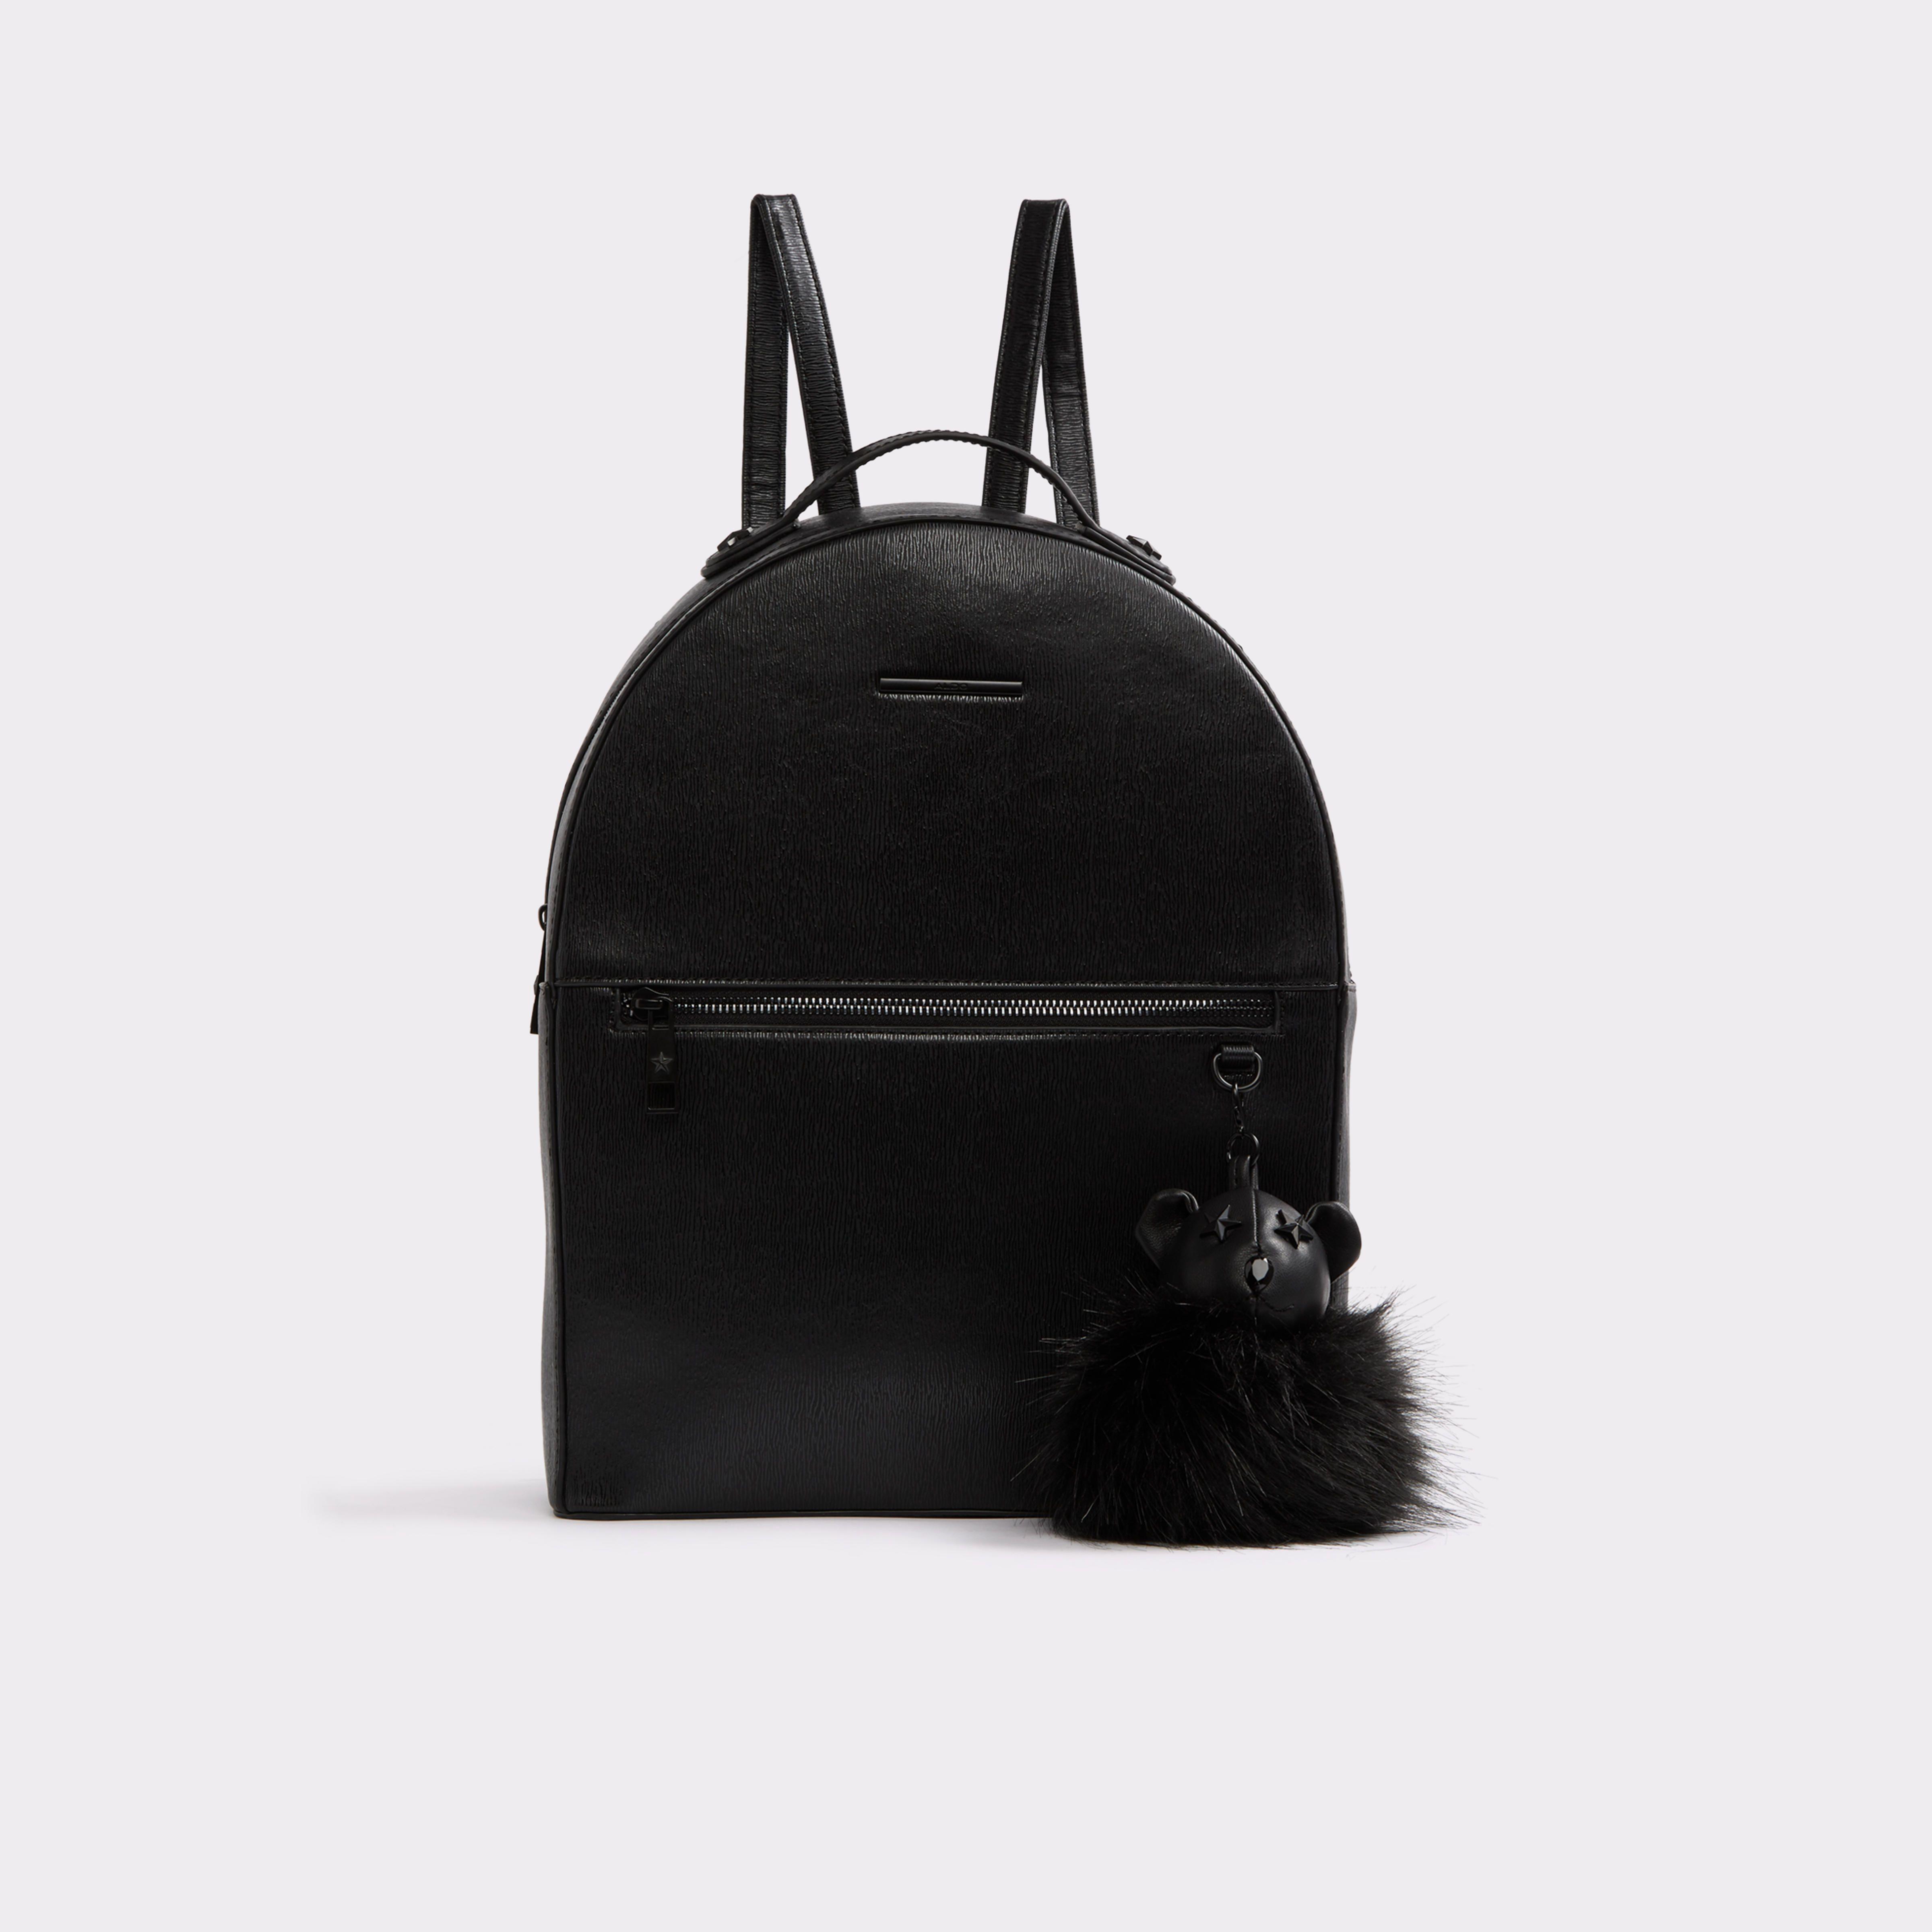 ffd2c0577e4 Fardella Black Backpack, Backpack Bags, Leather Backpack, Fashion Backpack,  Aldo Bags,